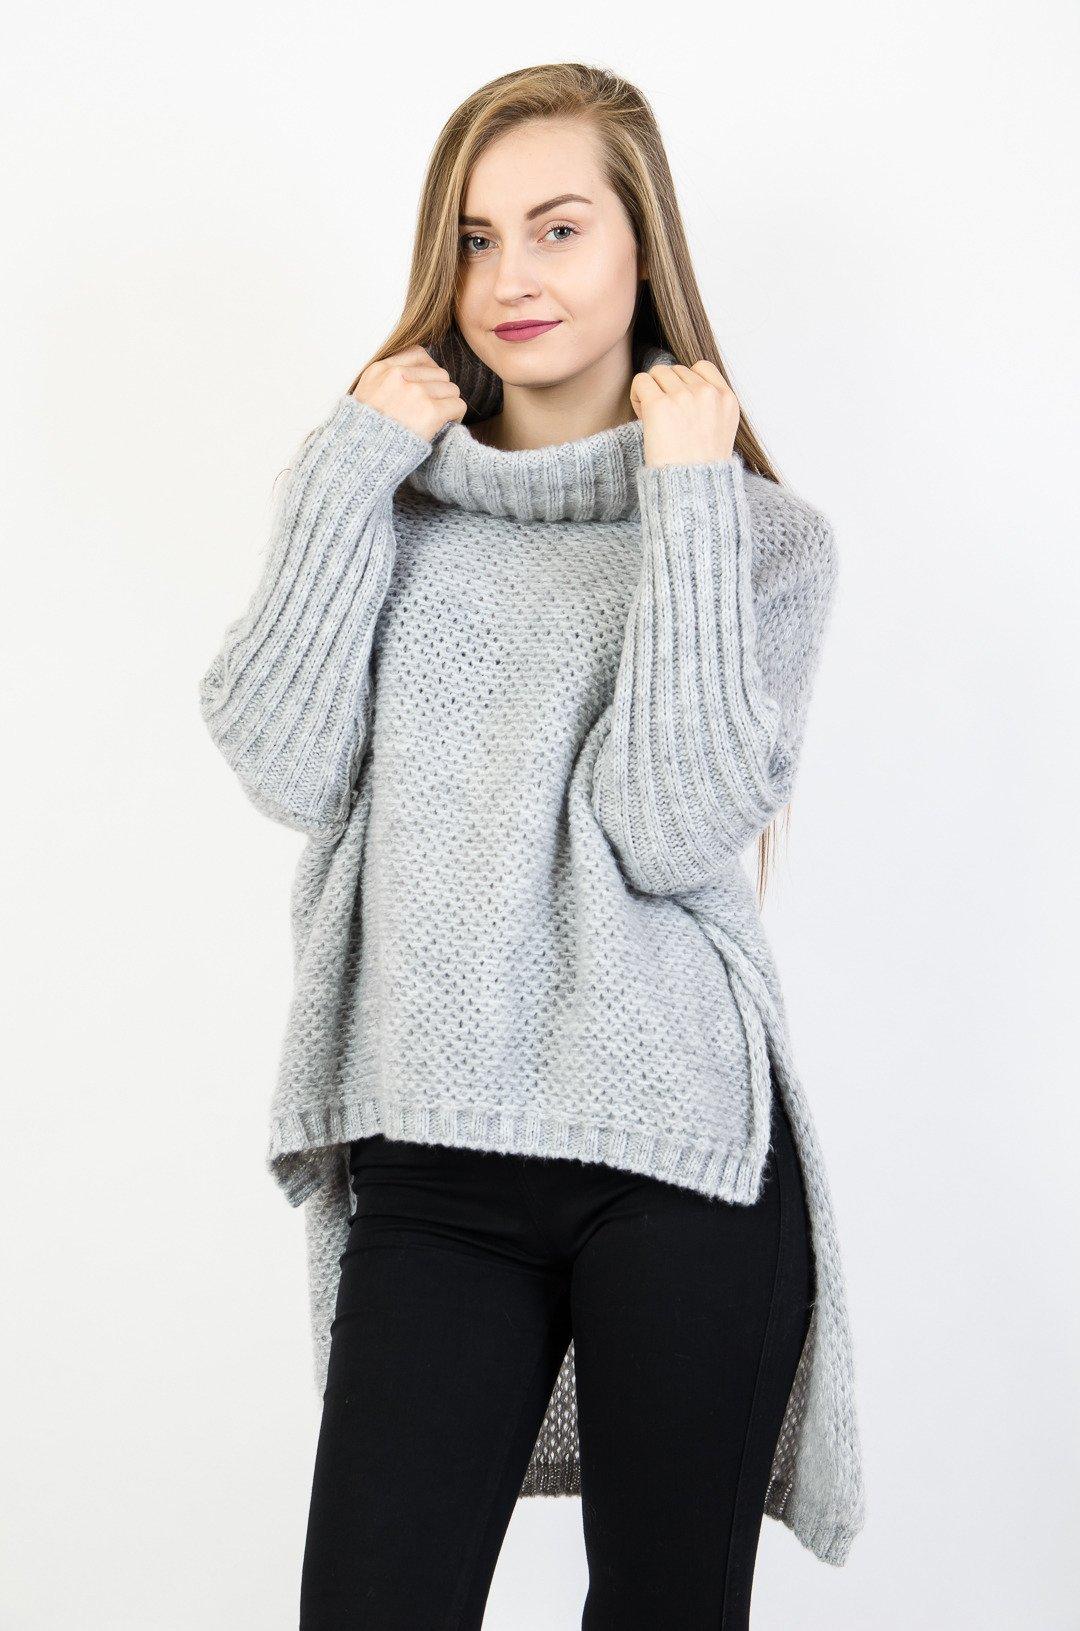 195d827093 Asymetryczny szary sweter oversize z golfem szary